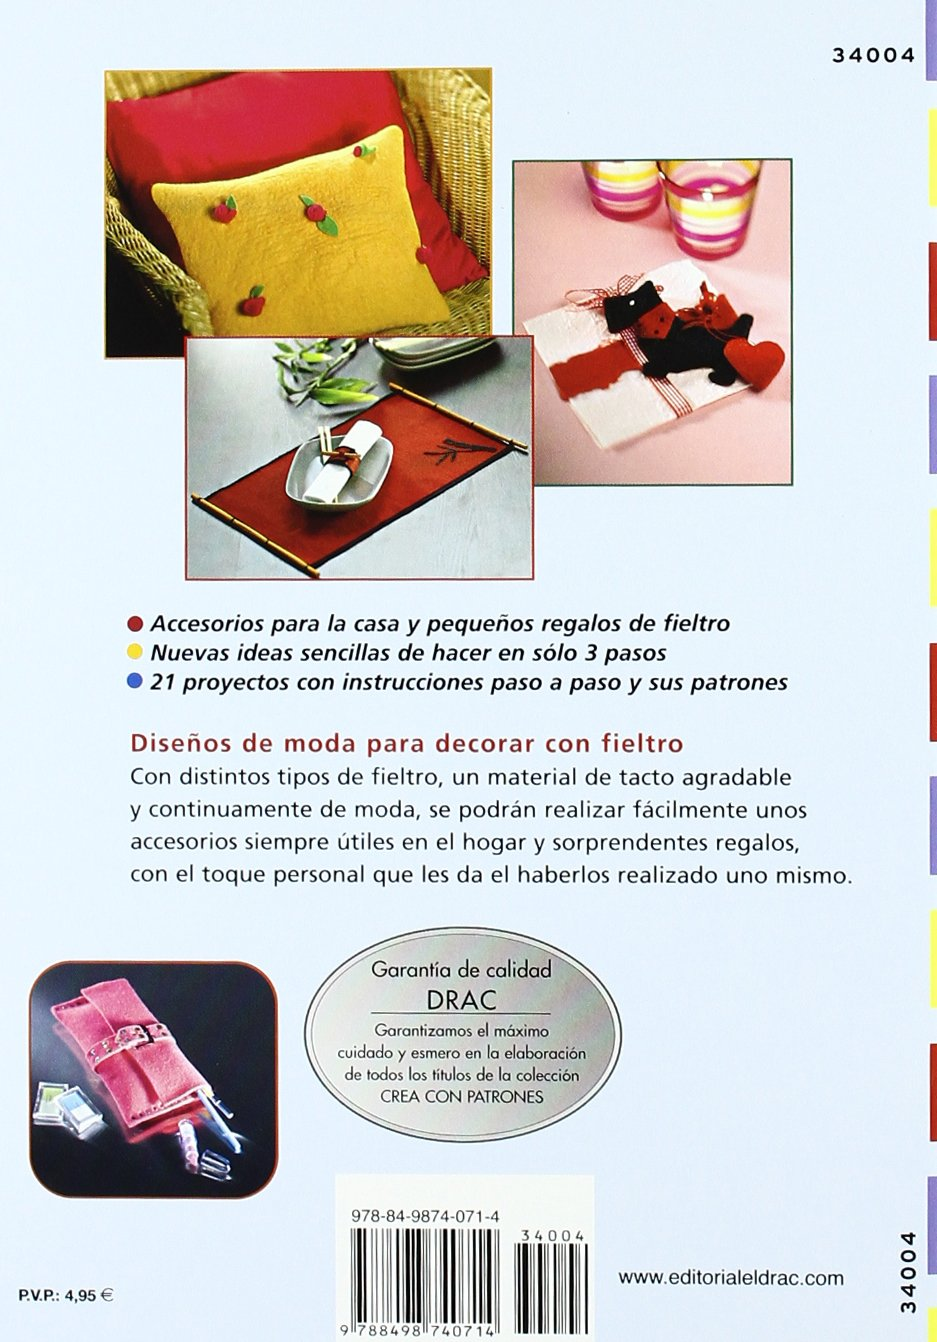 Libro con patrones, manualidades fieltro para decorar casa 2